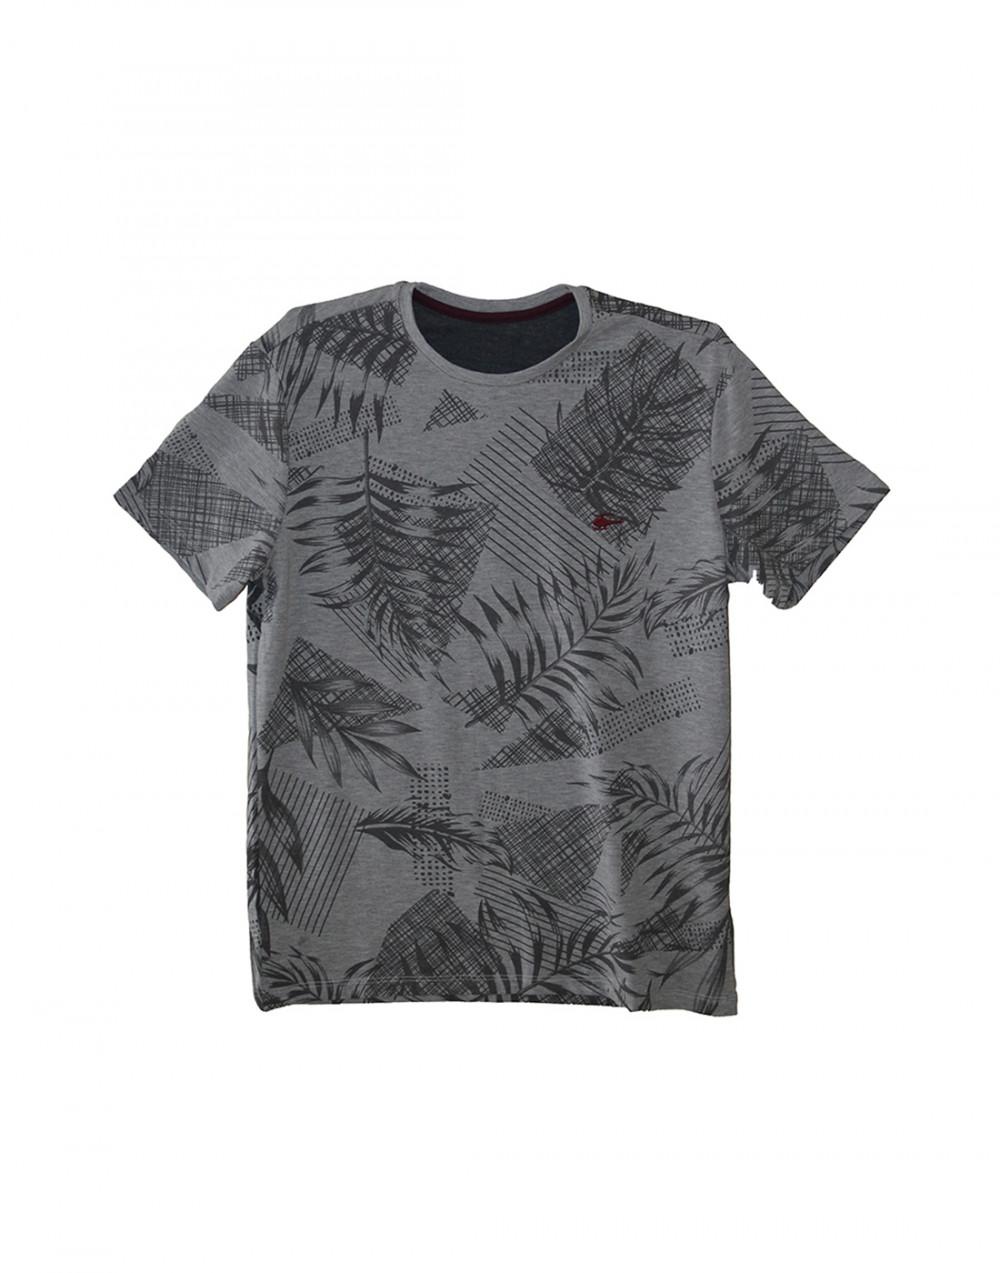 Camiseta Gola O. Estampada Mescla Sallo